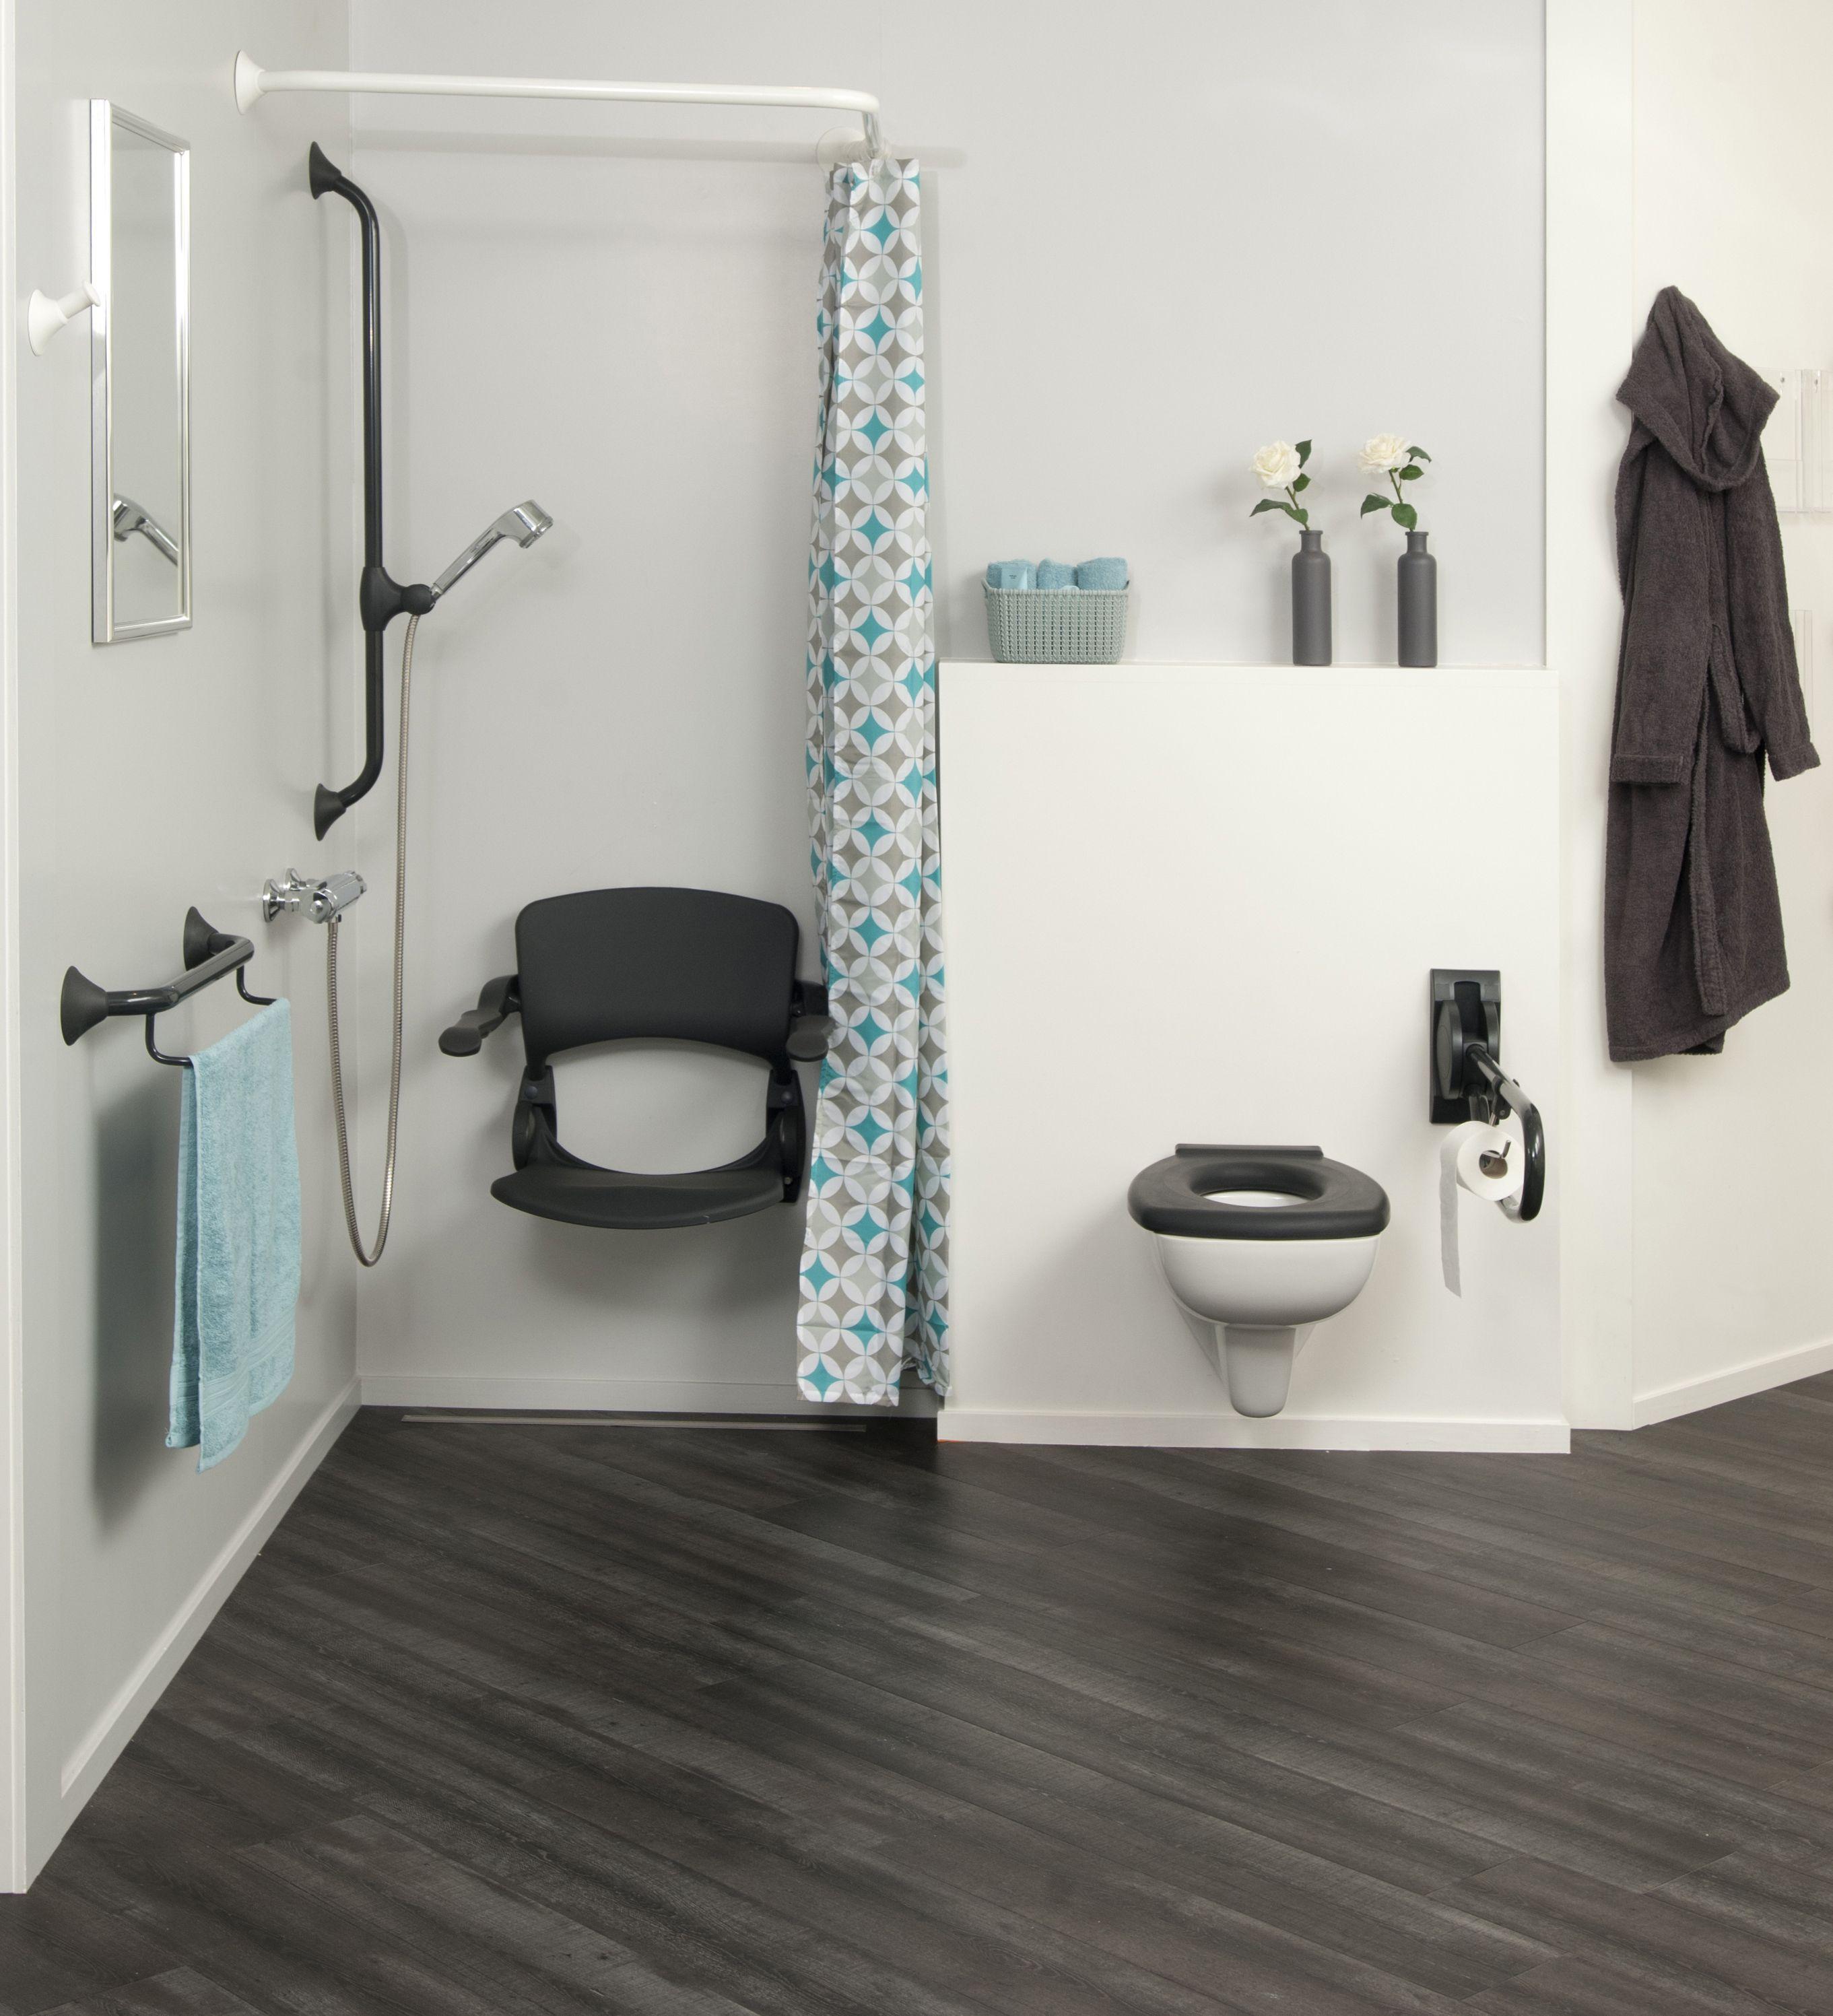 Bathroom Designs Elderly Handicapped Elderly Bathroom Design Elderly ...